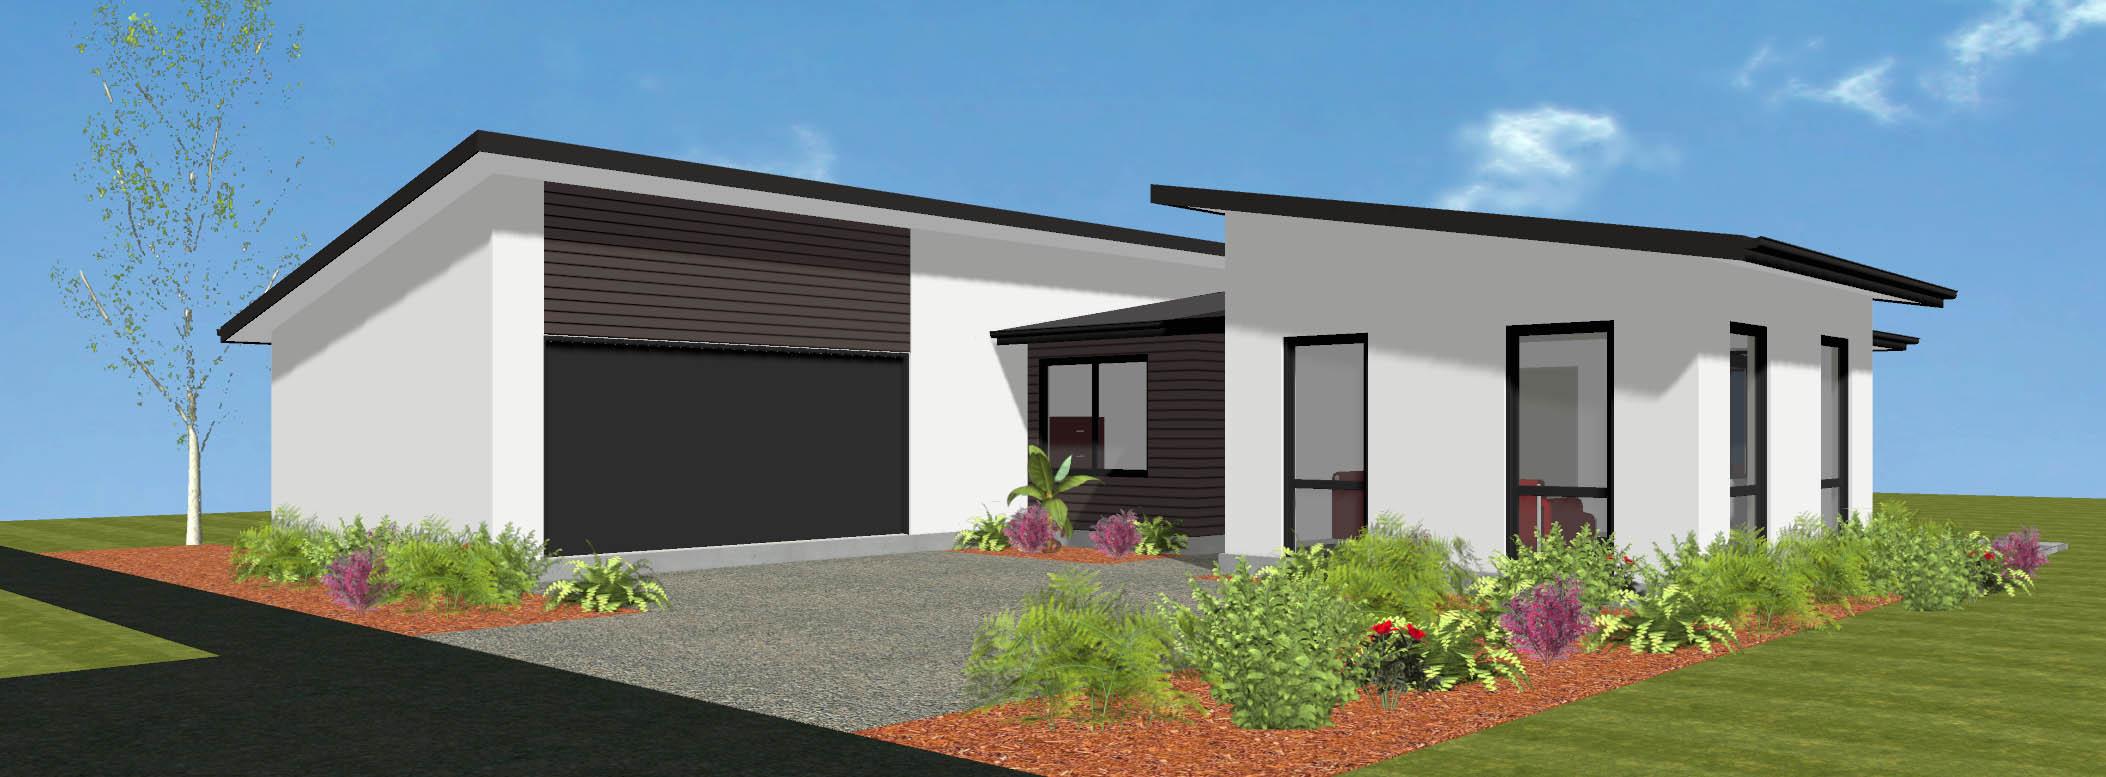 Piha new house plan and design wellington kapiti wairarapa for Home design diamonds